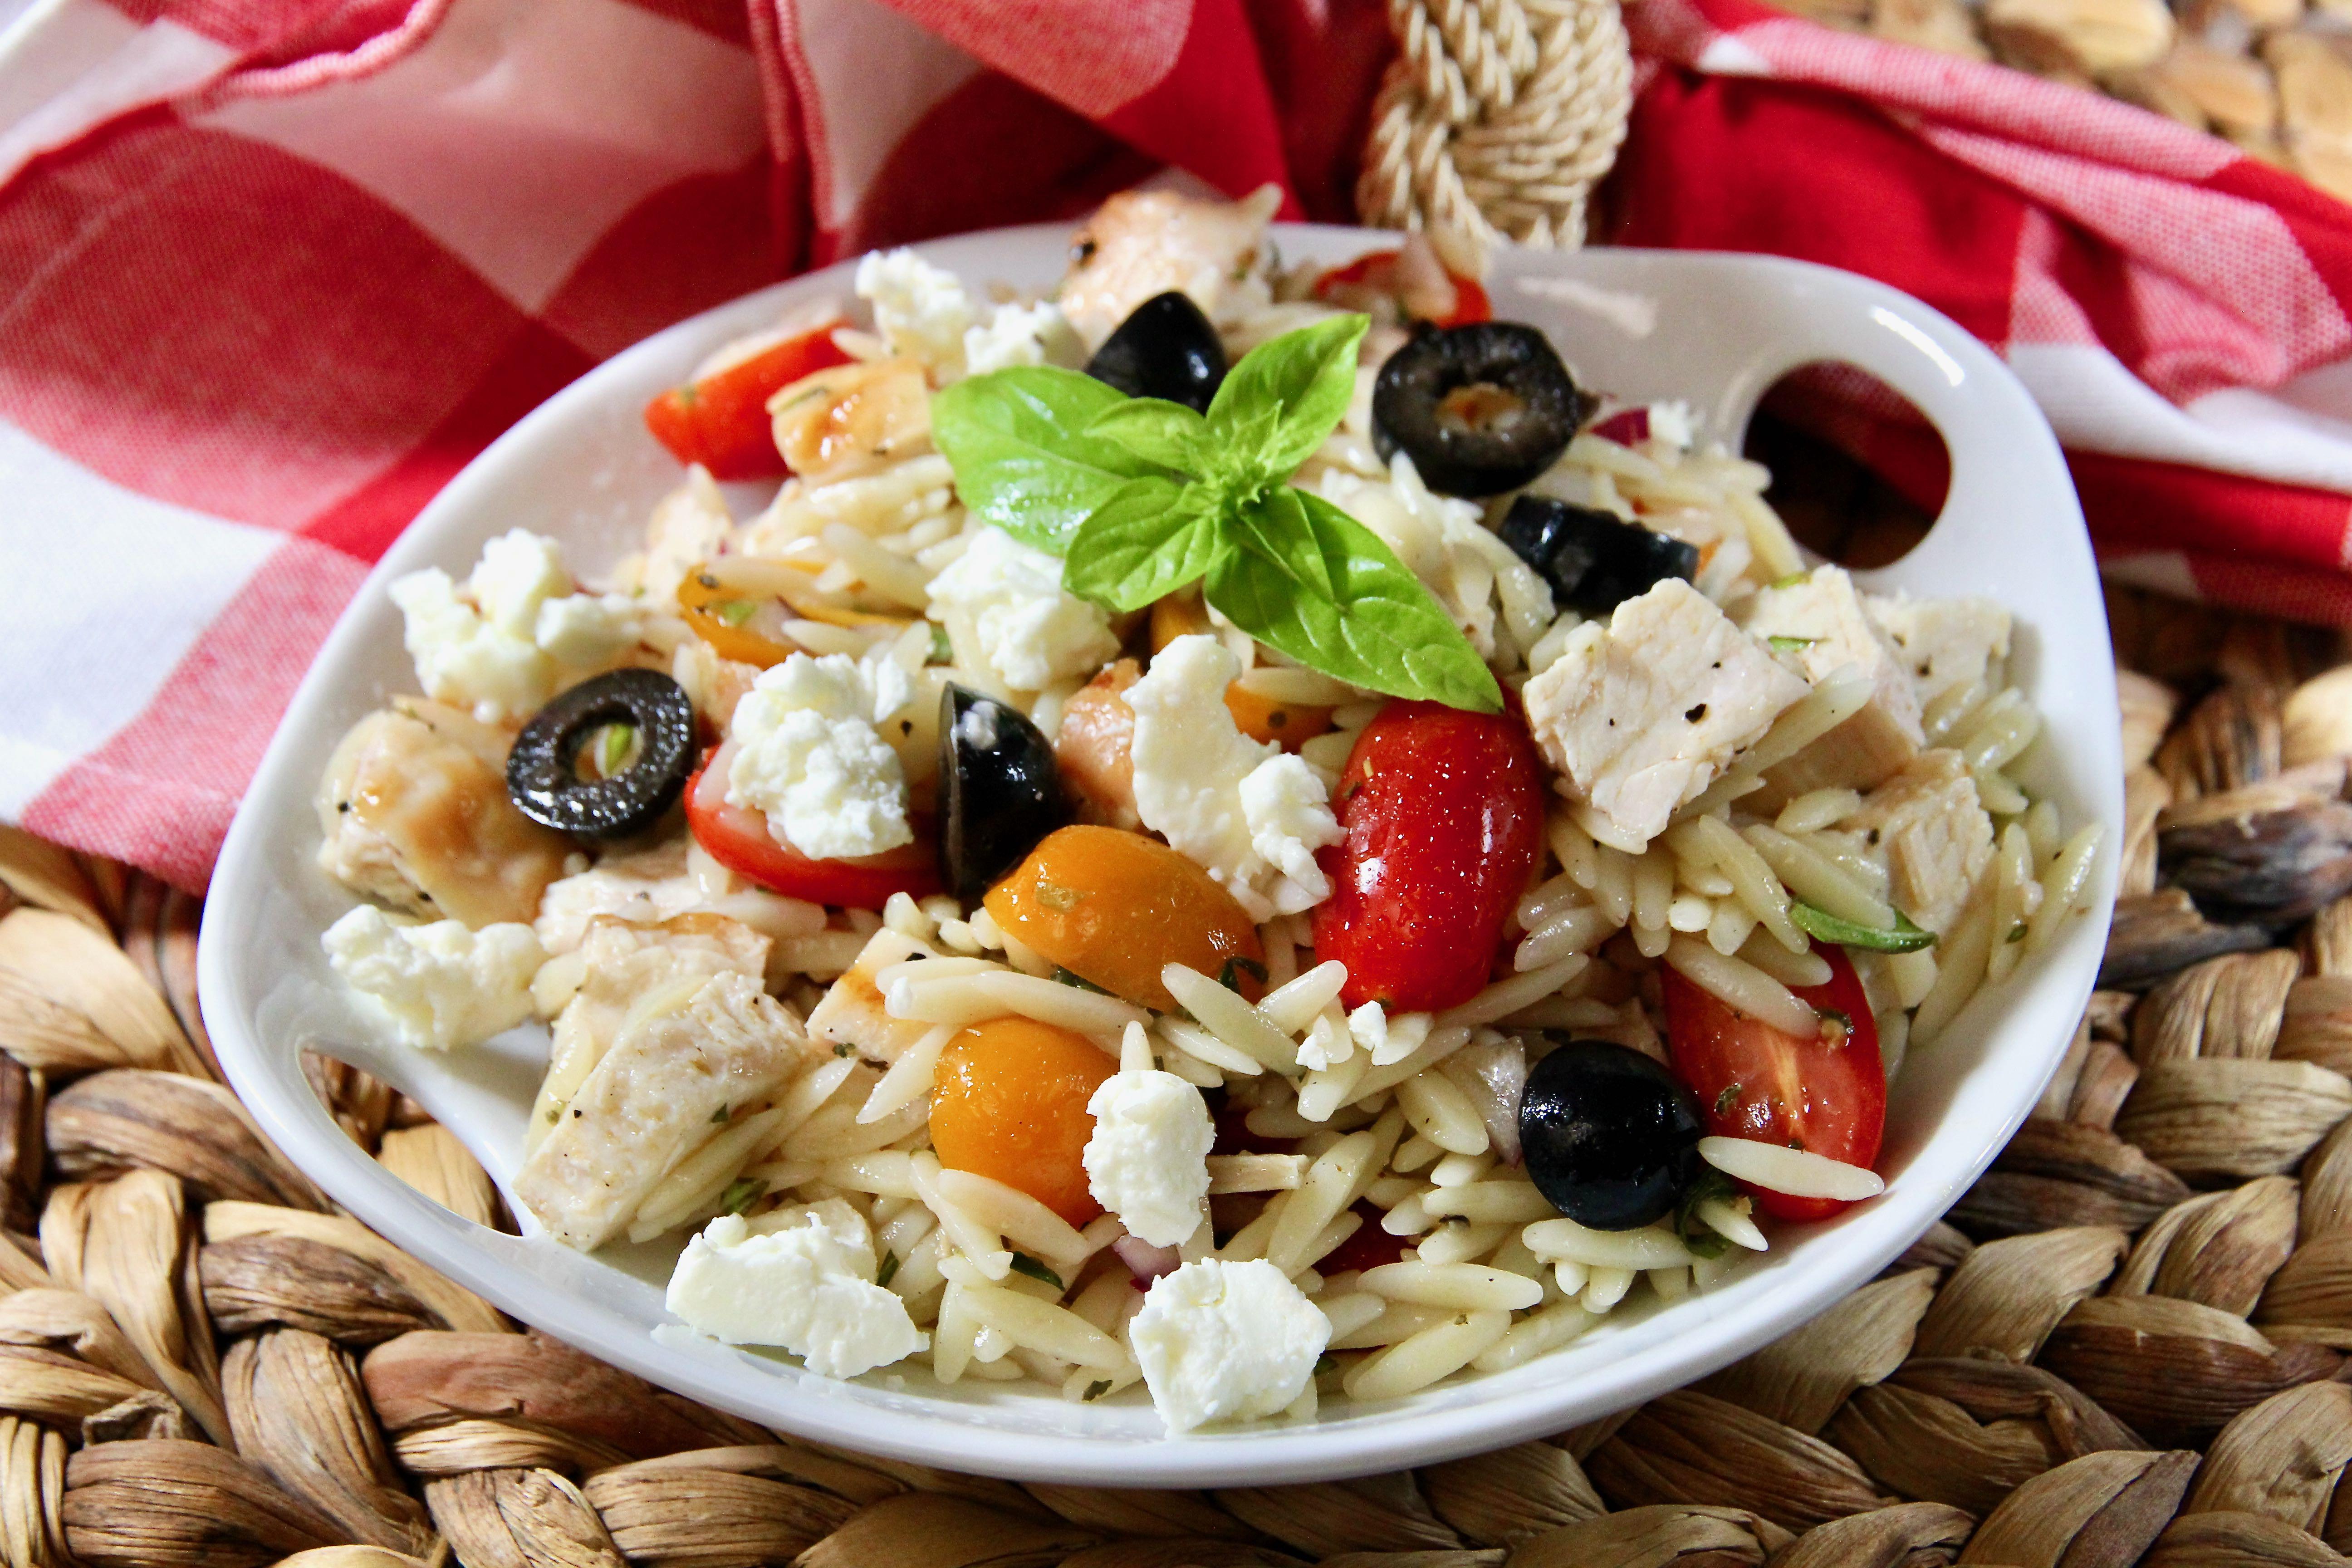 Speedy Chicken, Feta, and Orzo Salad